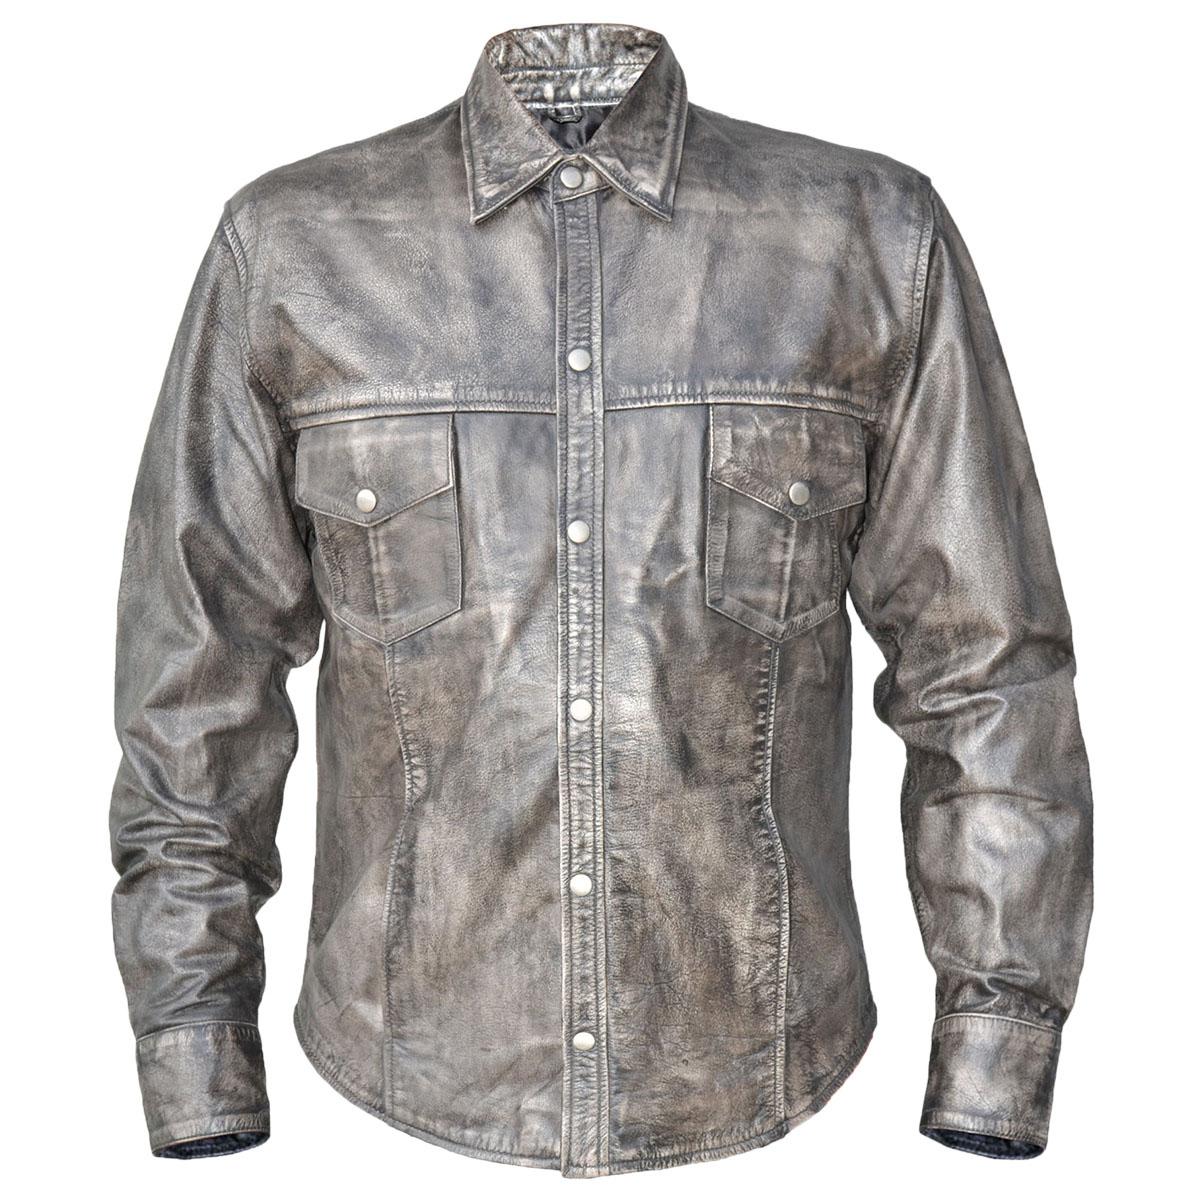 Xelement BXU85200 Urban Armor Comfort Mens Grey Leather S...